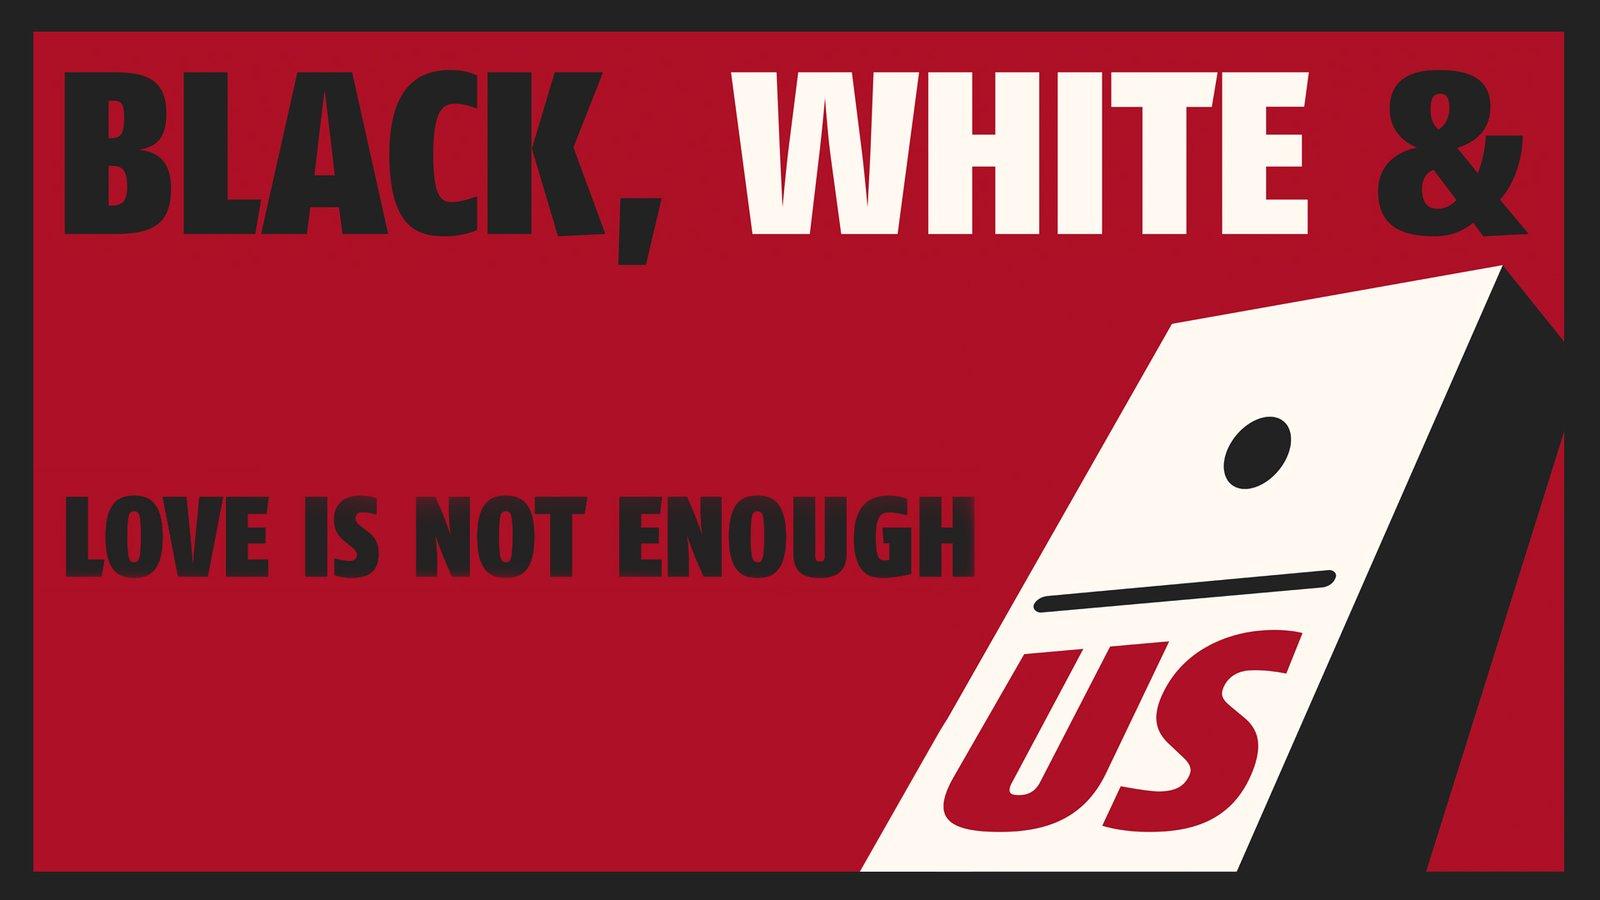 Black, White & Us